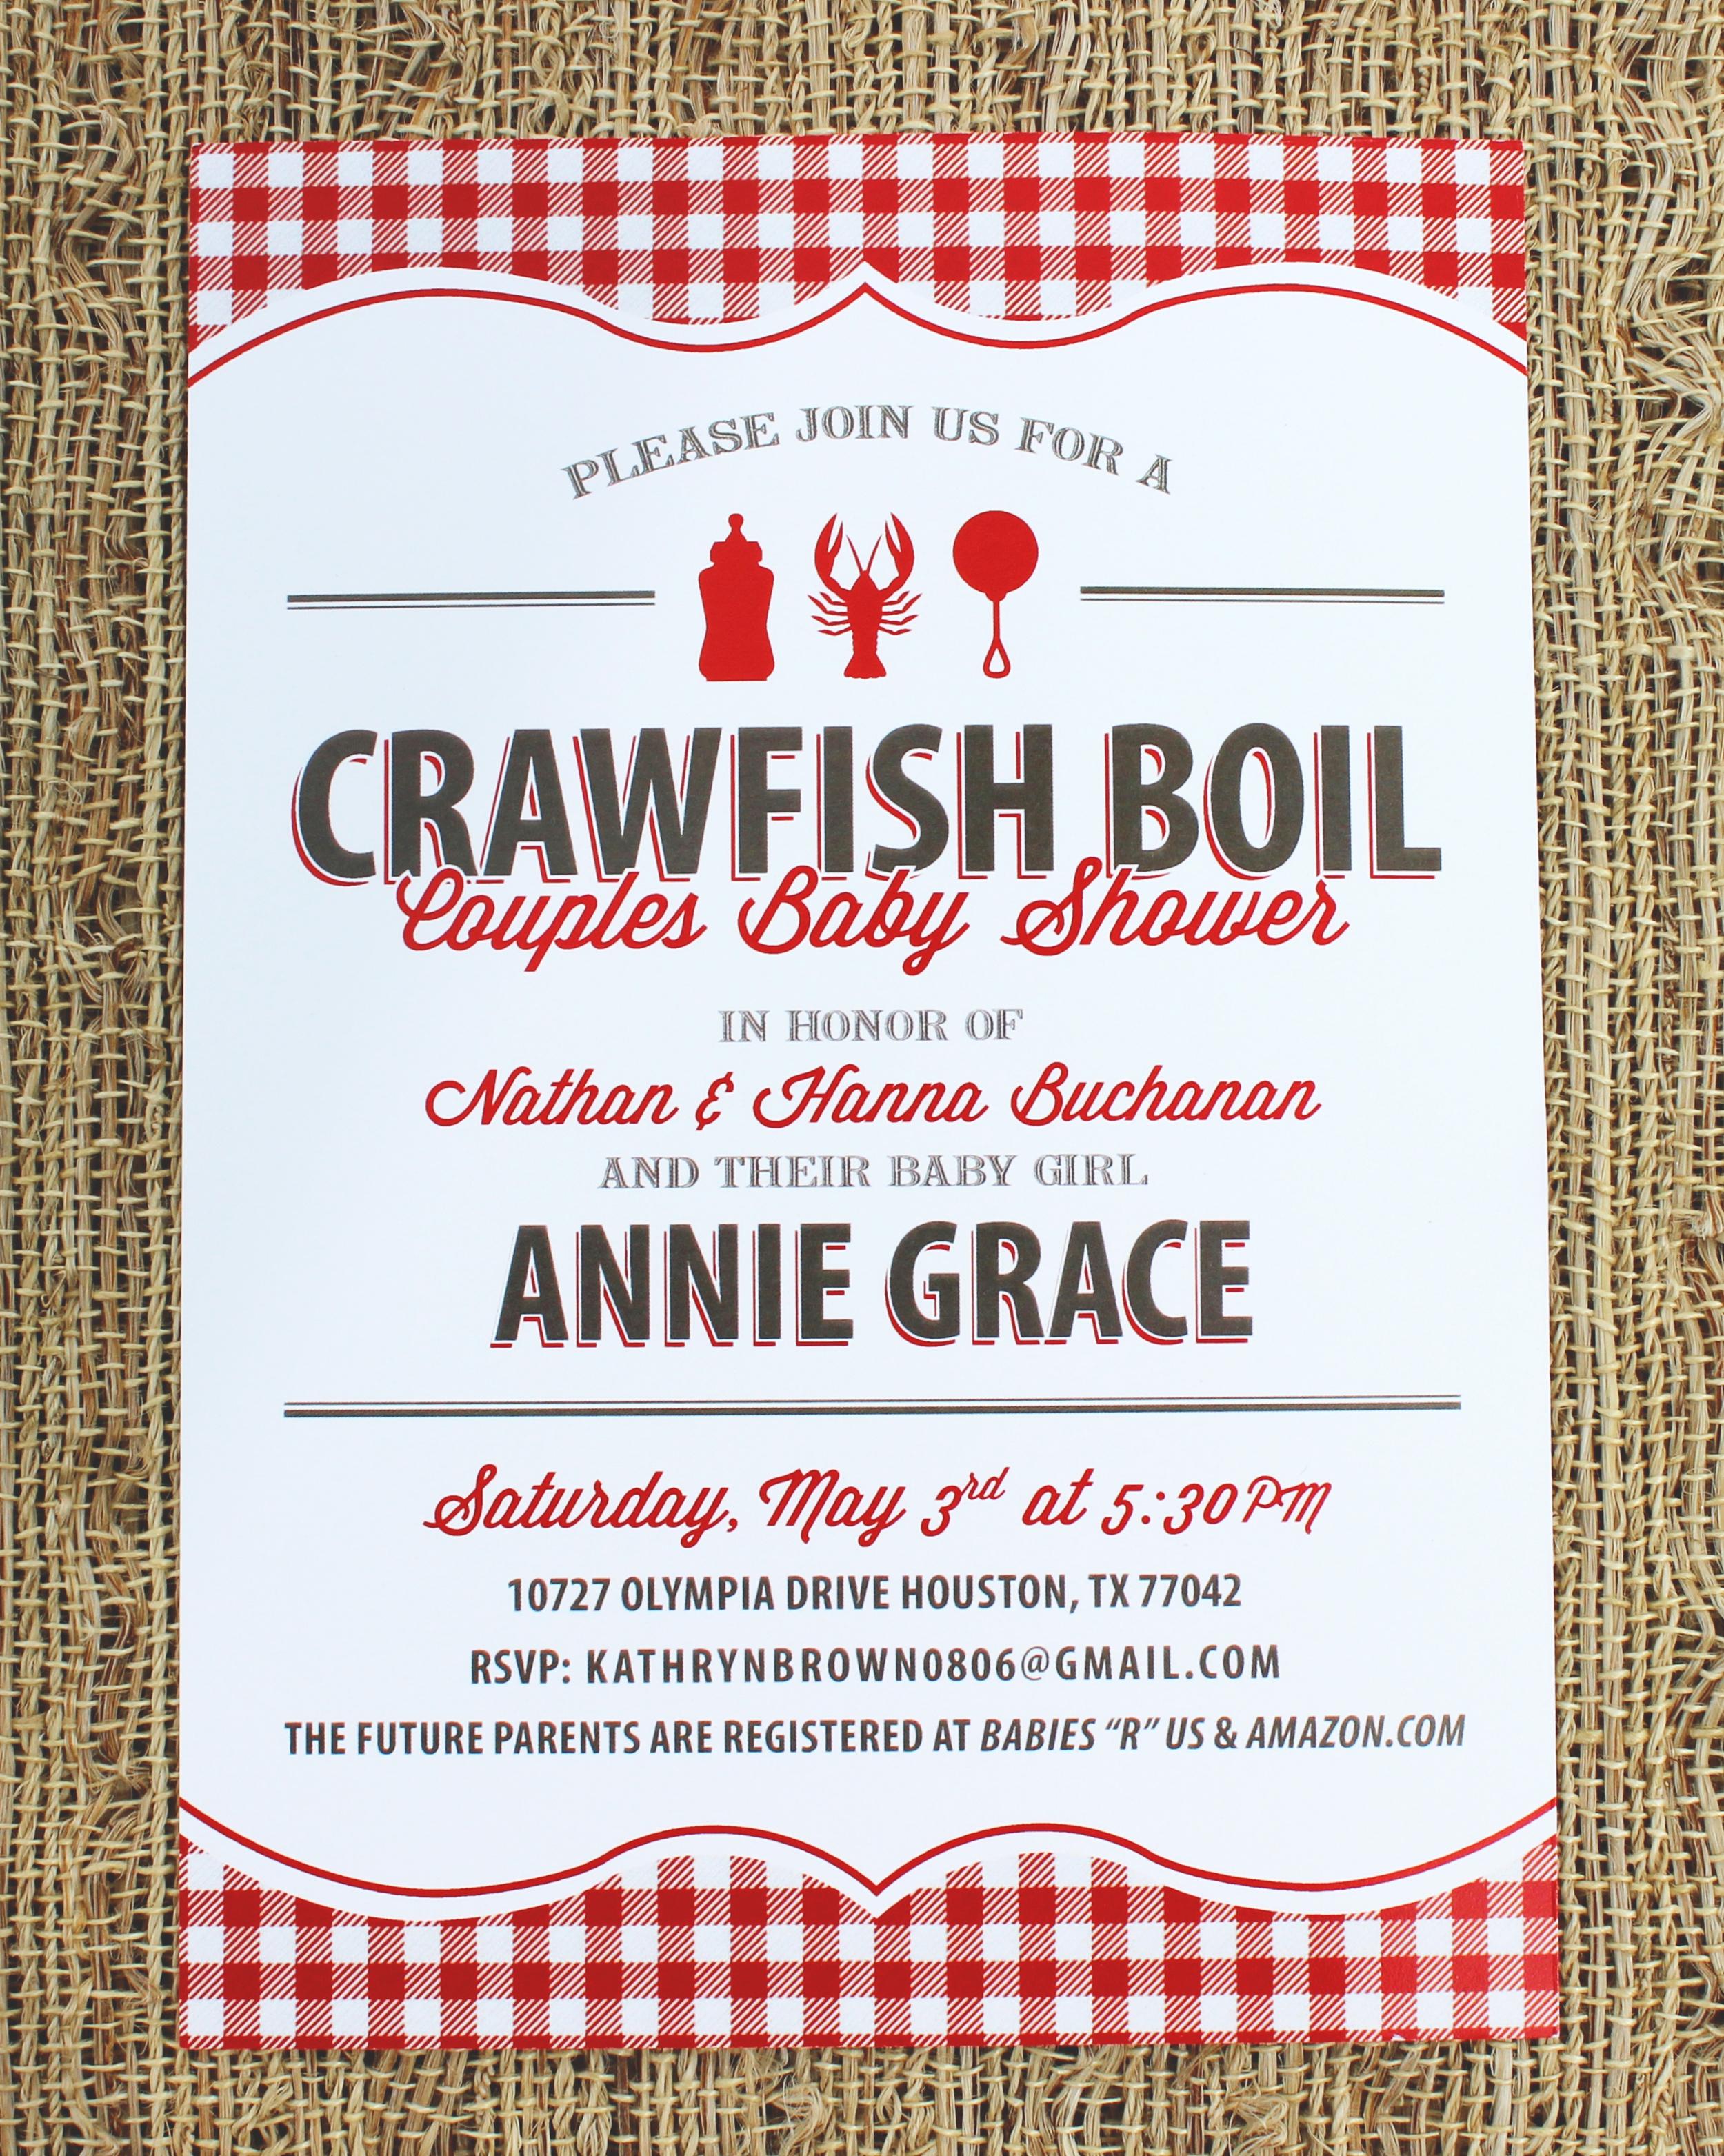 Crawfish2.jpg